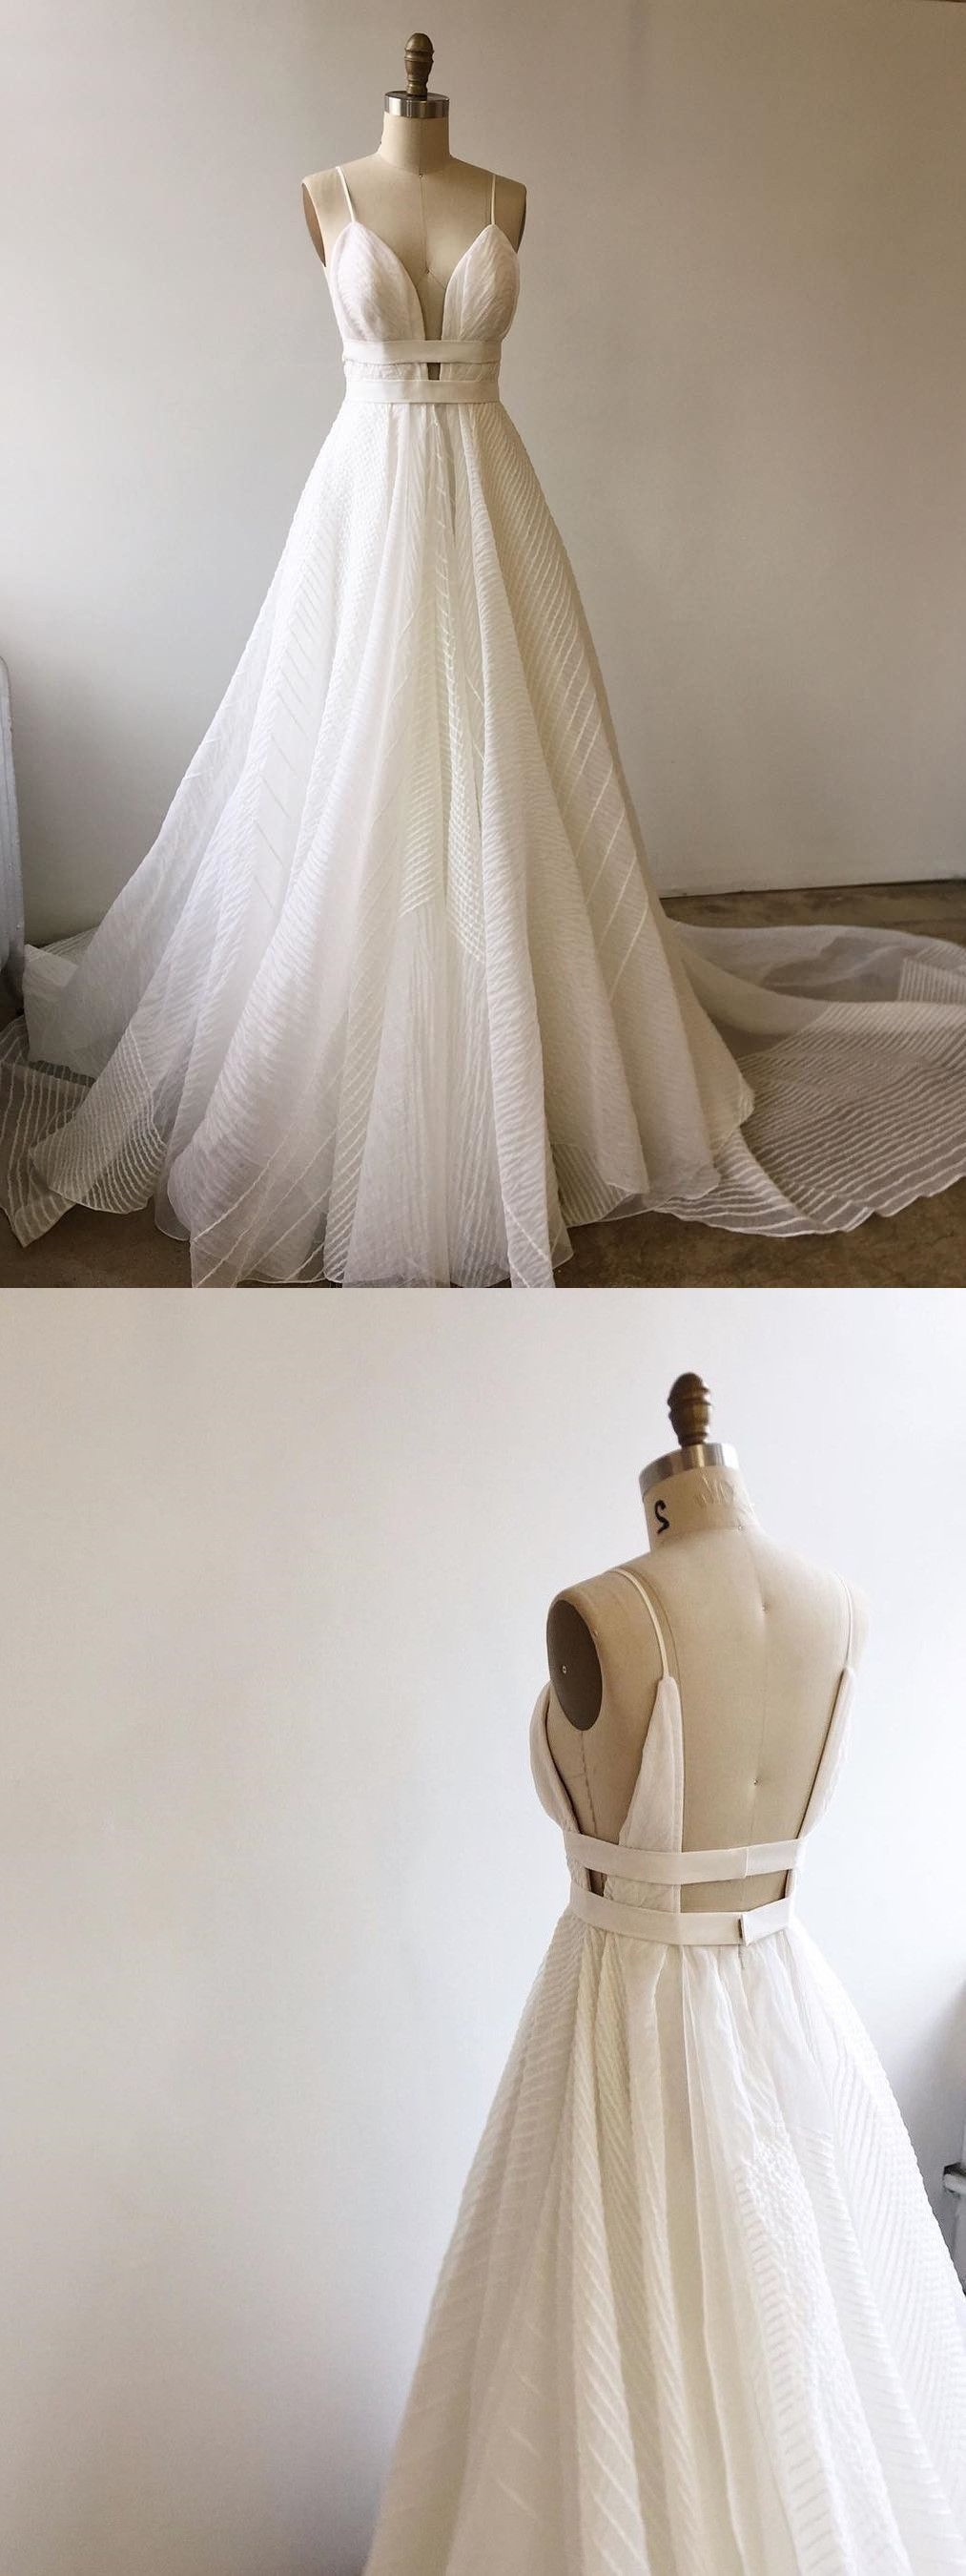 Aline straps long wedding dress wedding dress ball gown